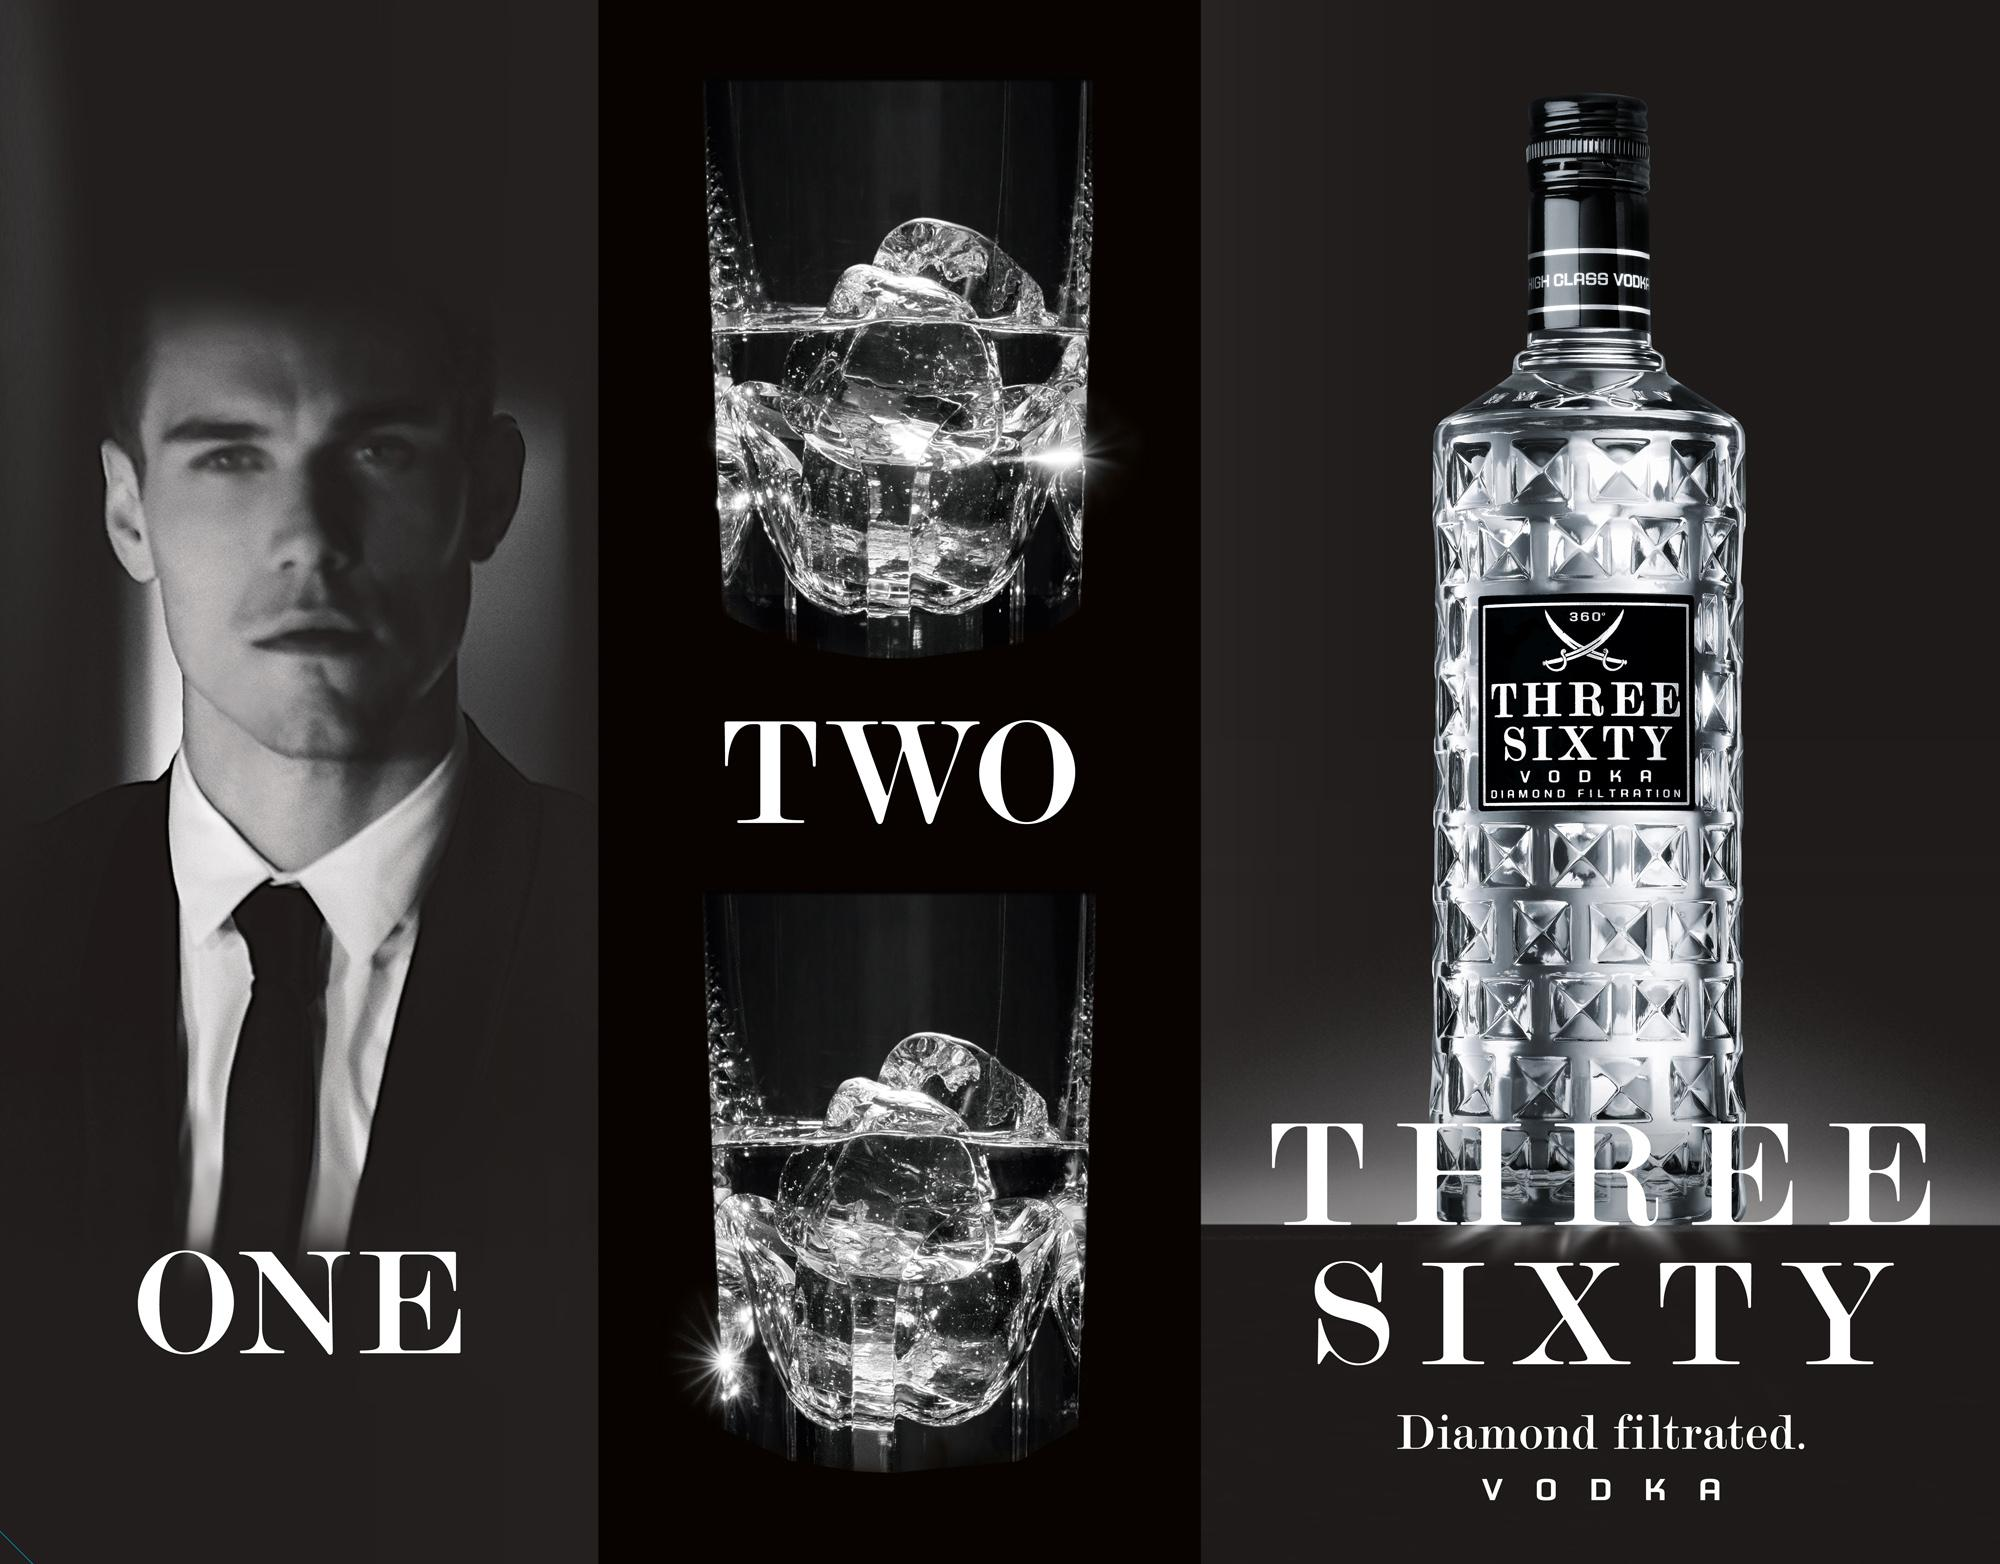 one two three sixty vodka neue kampagne und tv spot. Black Bedroom Furniture Sets. Home Design Ideas